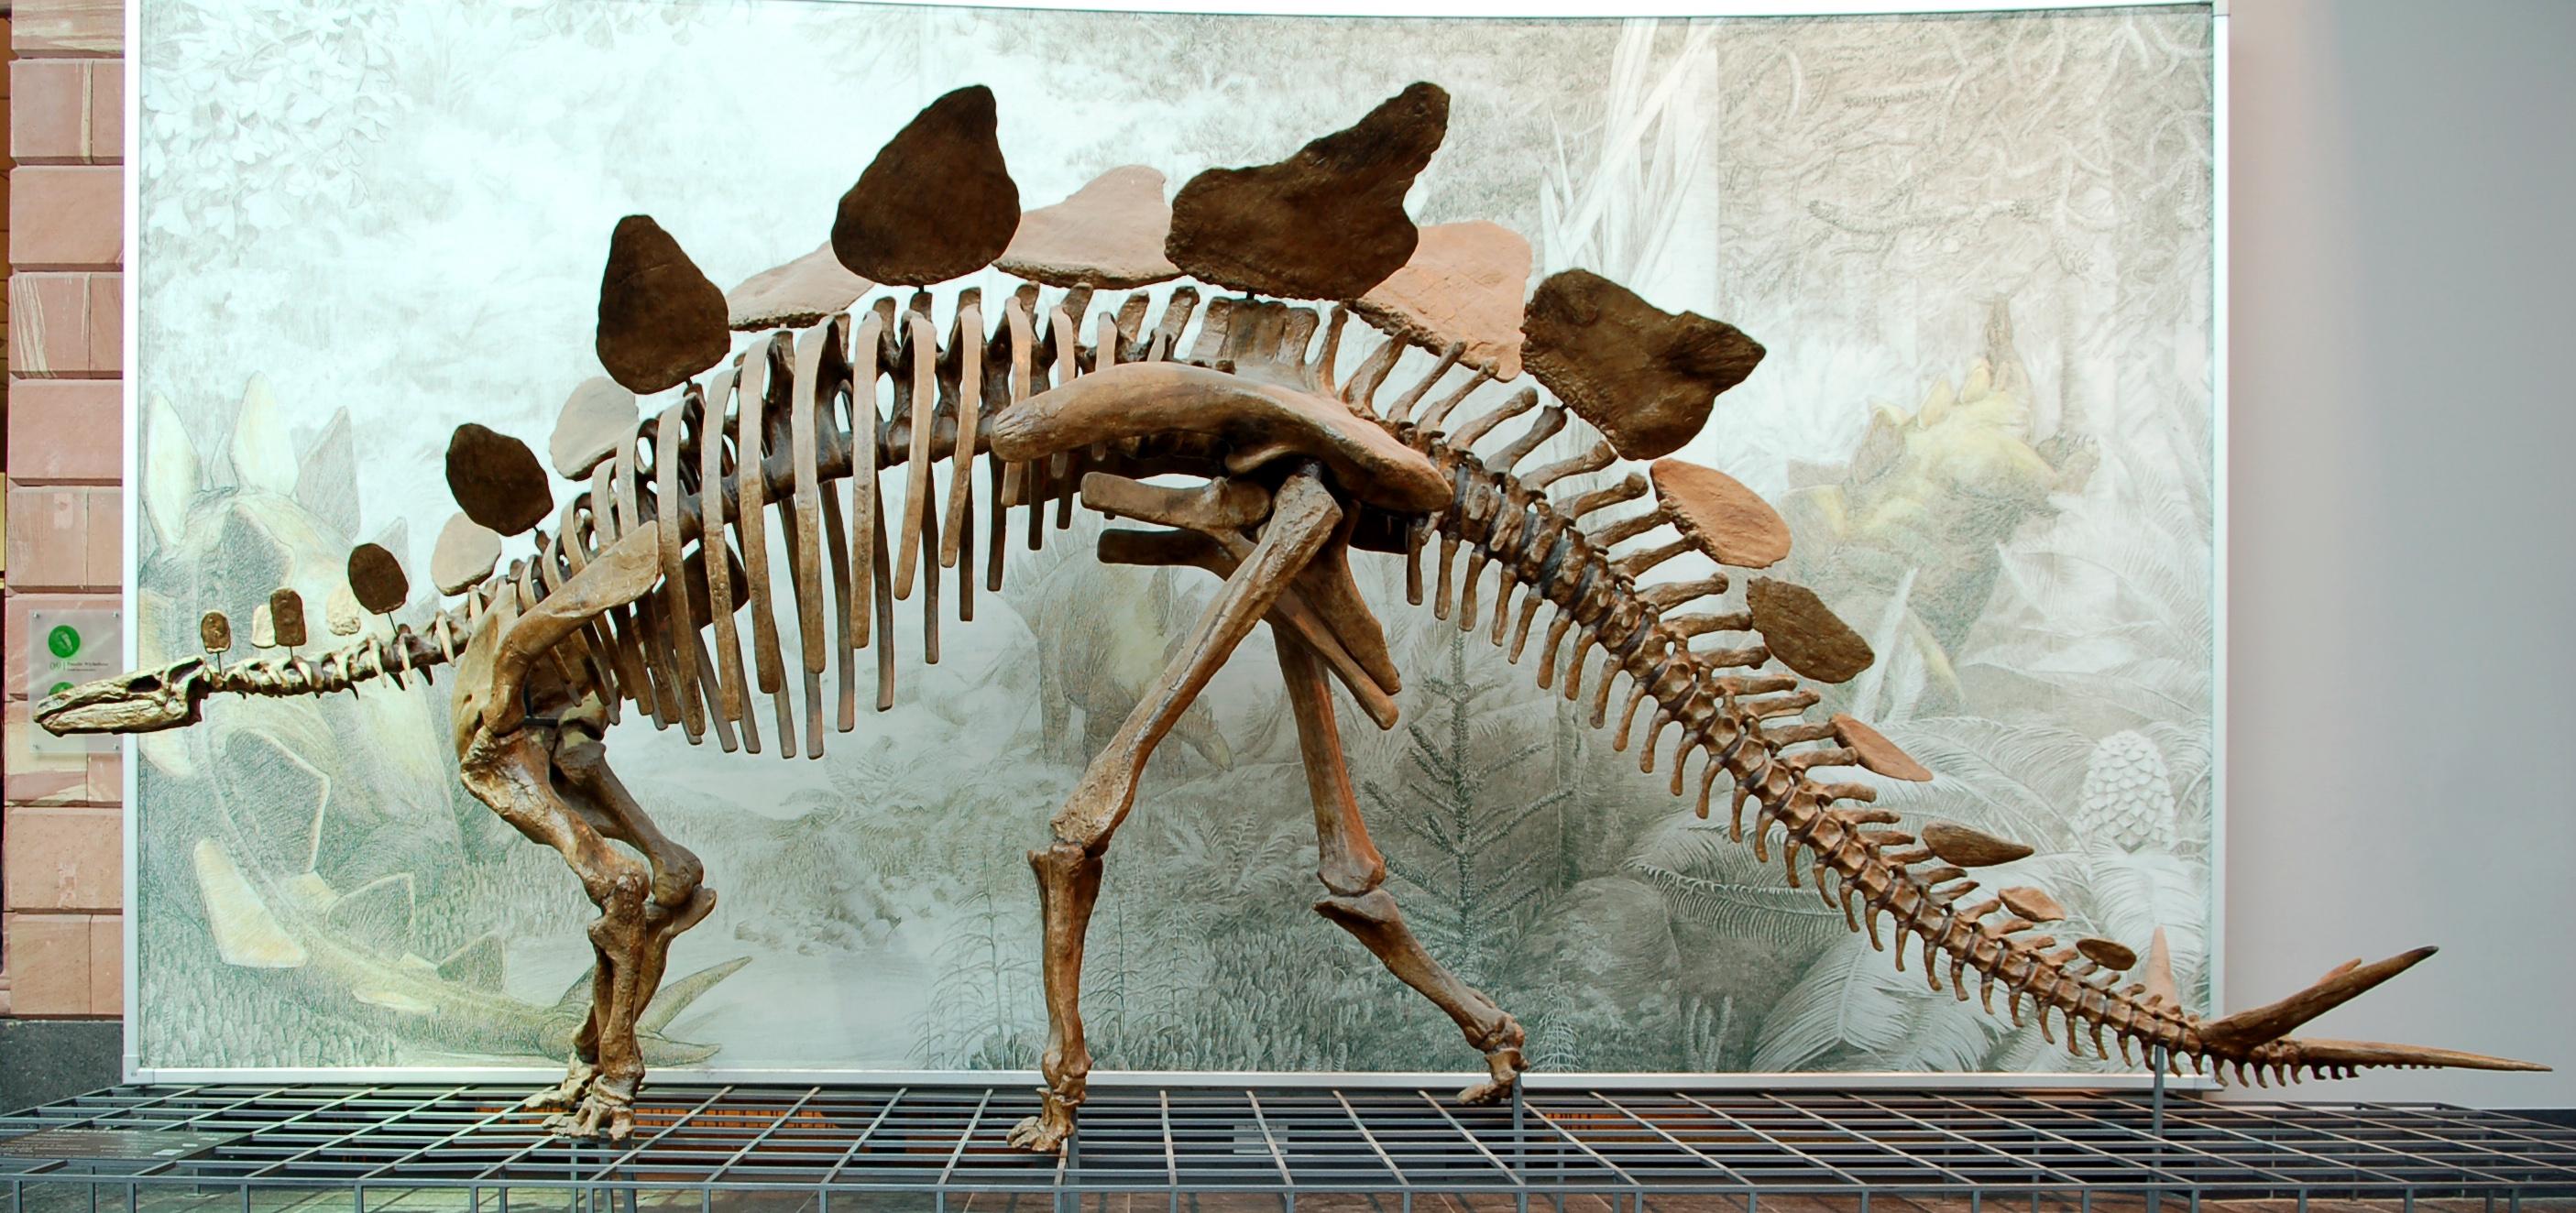 [Image: Stegosaurus_Senckenberg.jpg]